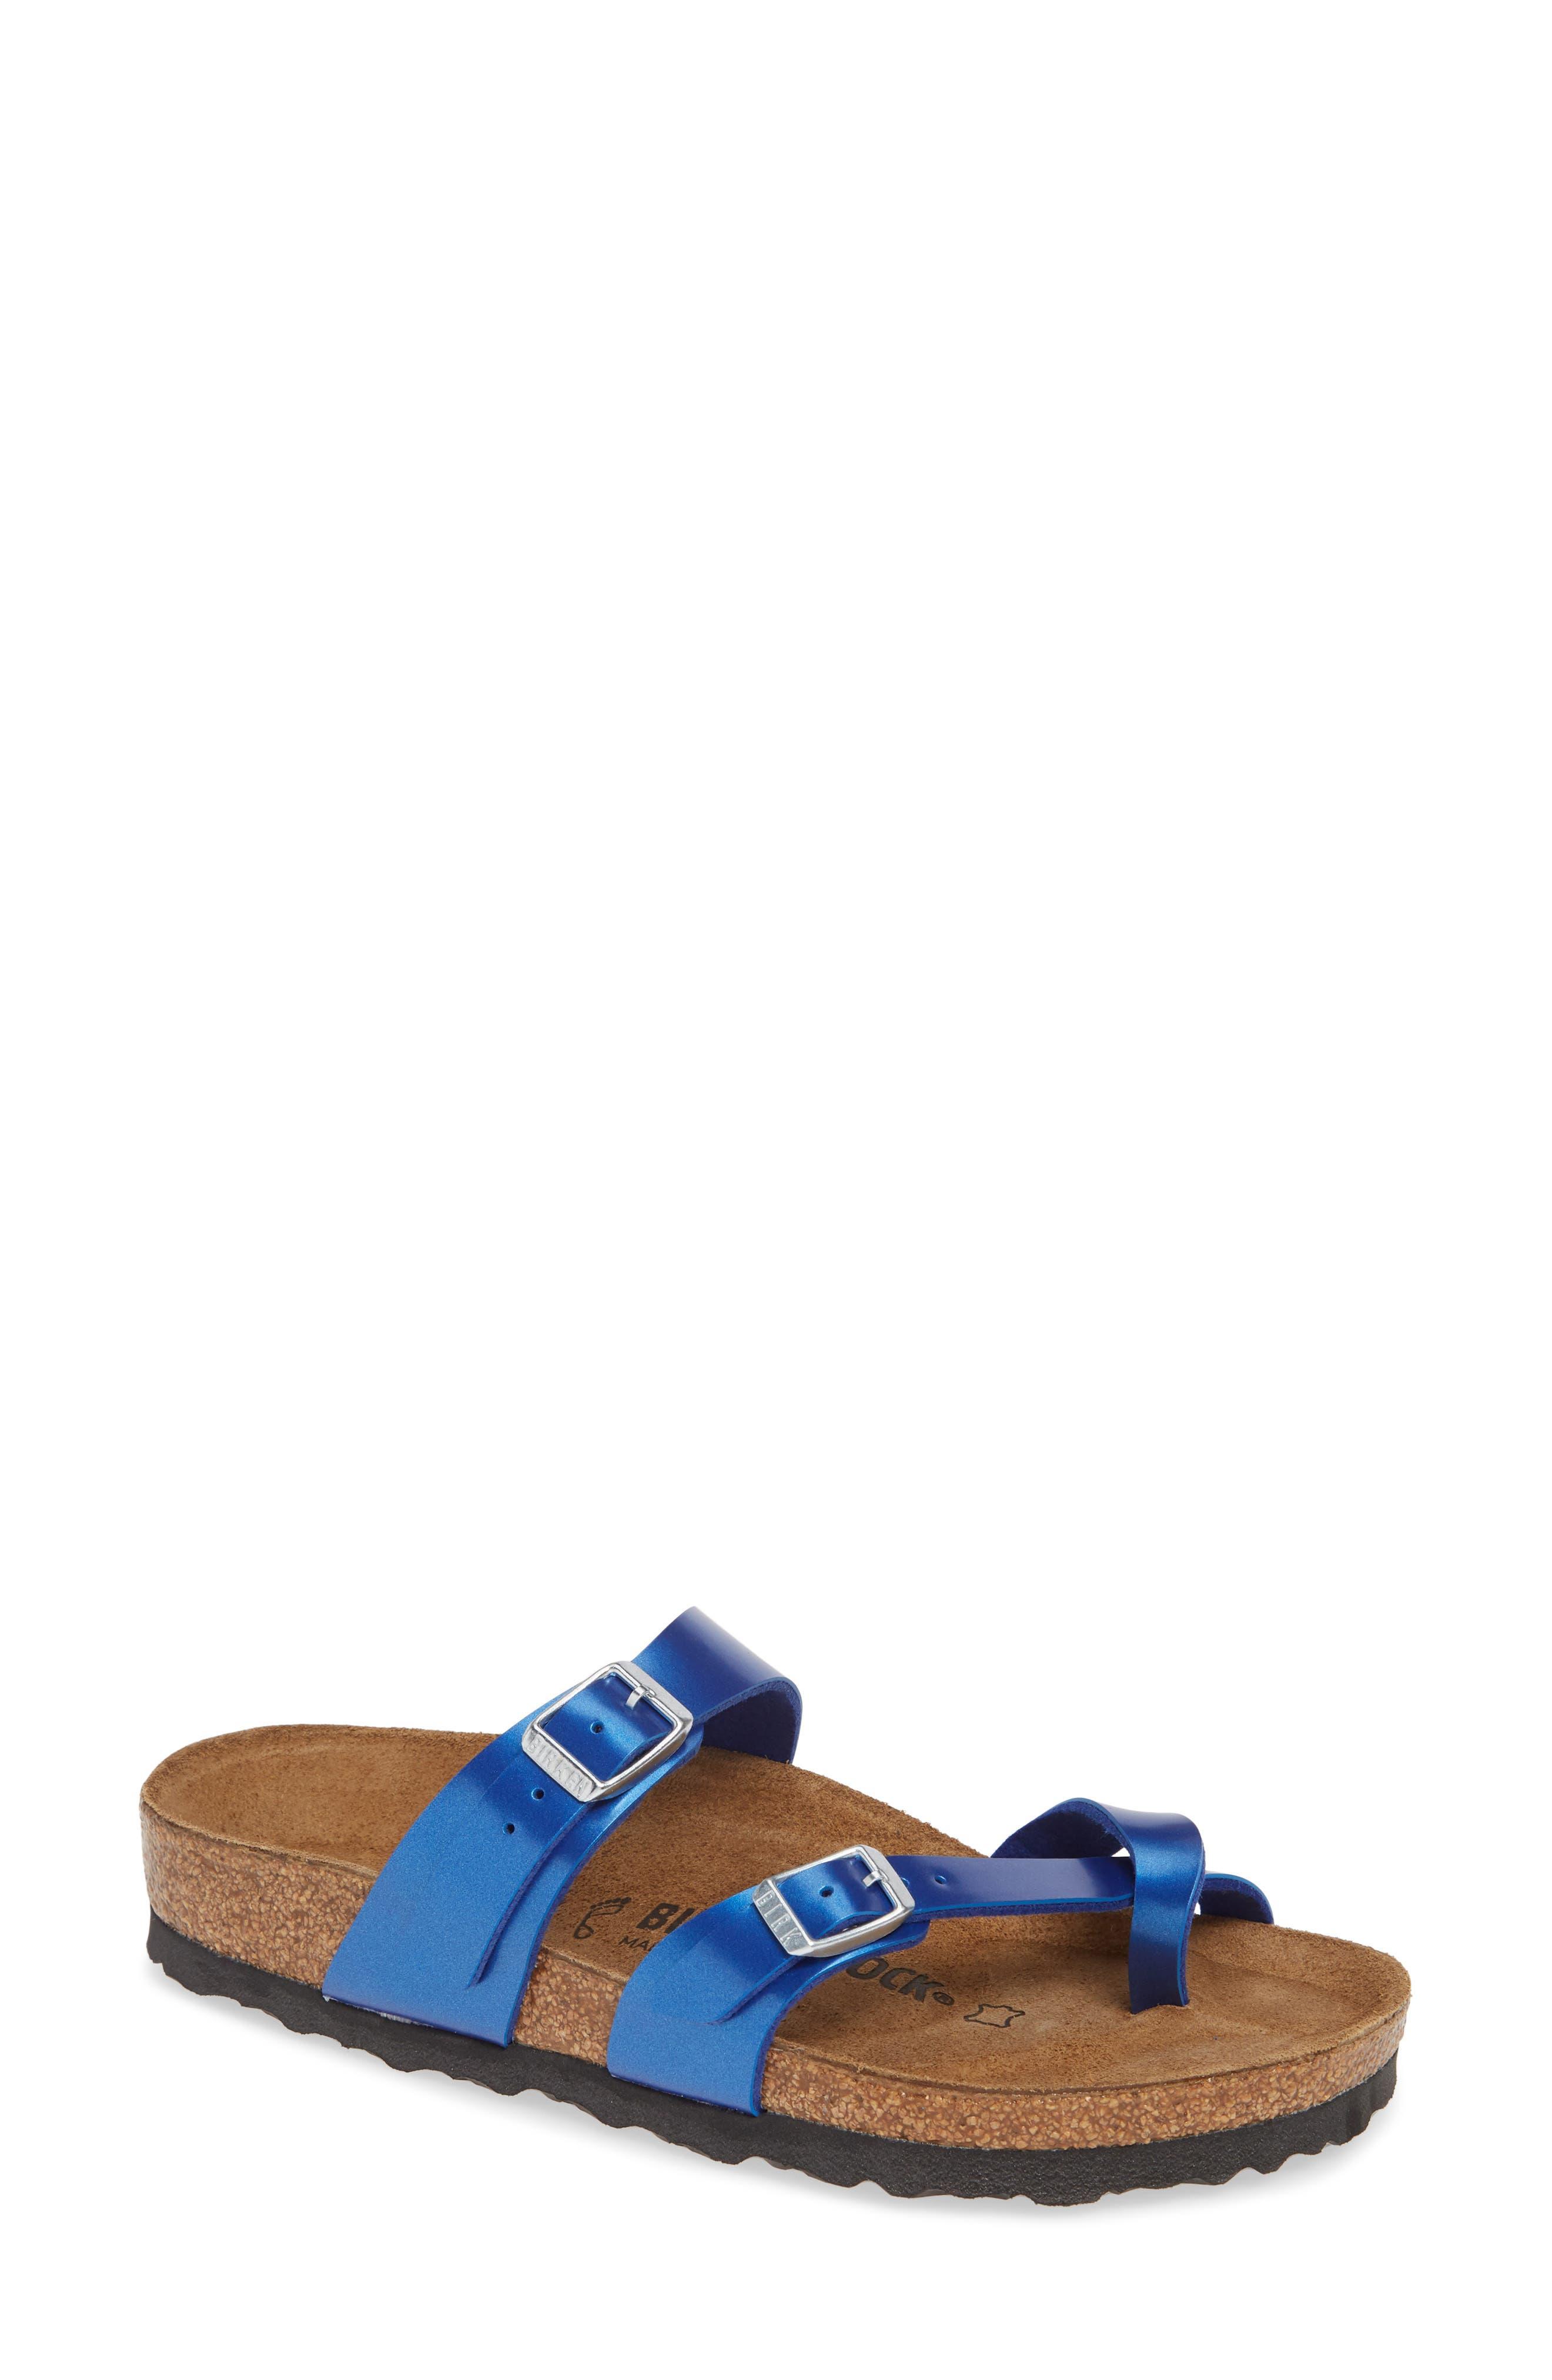 Birkenstock Mayari Slide Sandal,8.5 B - Blue